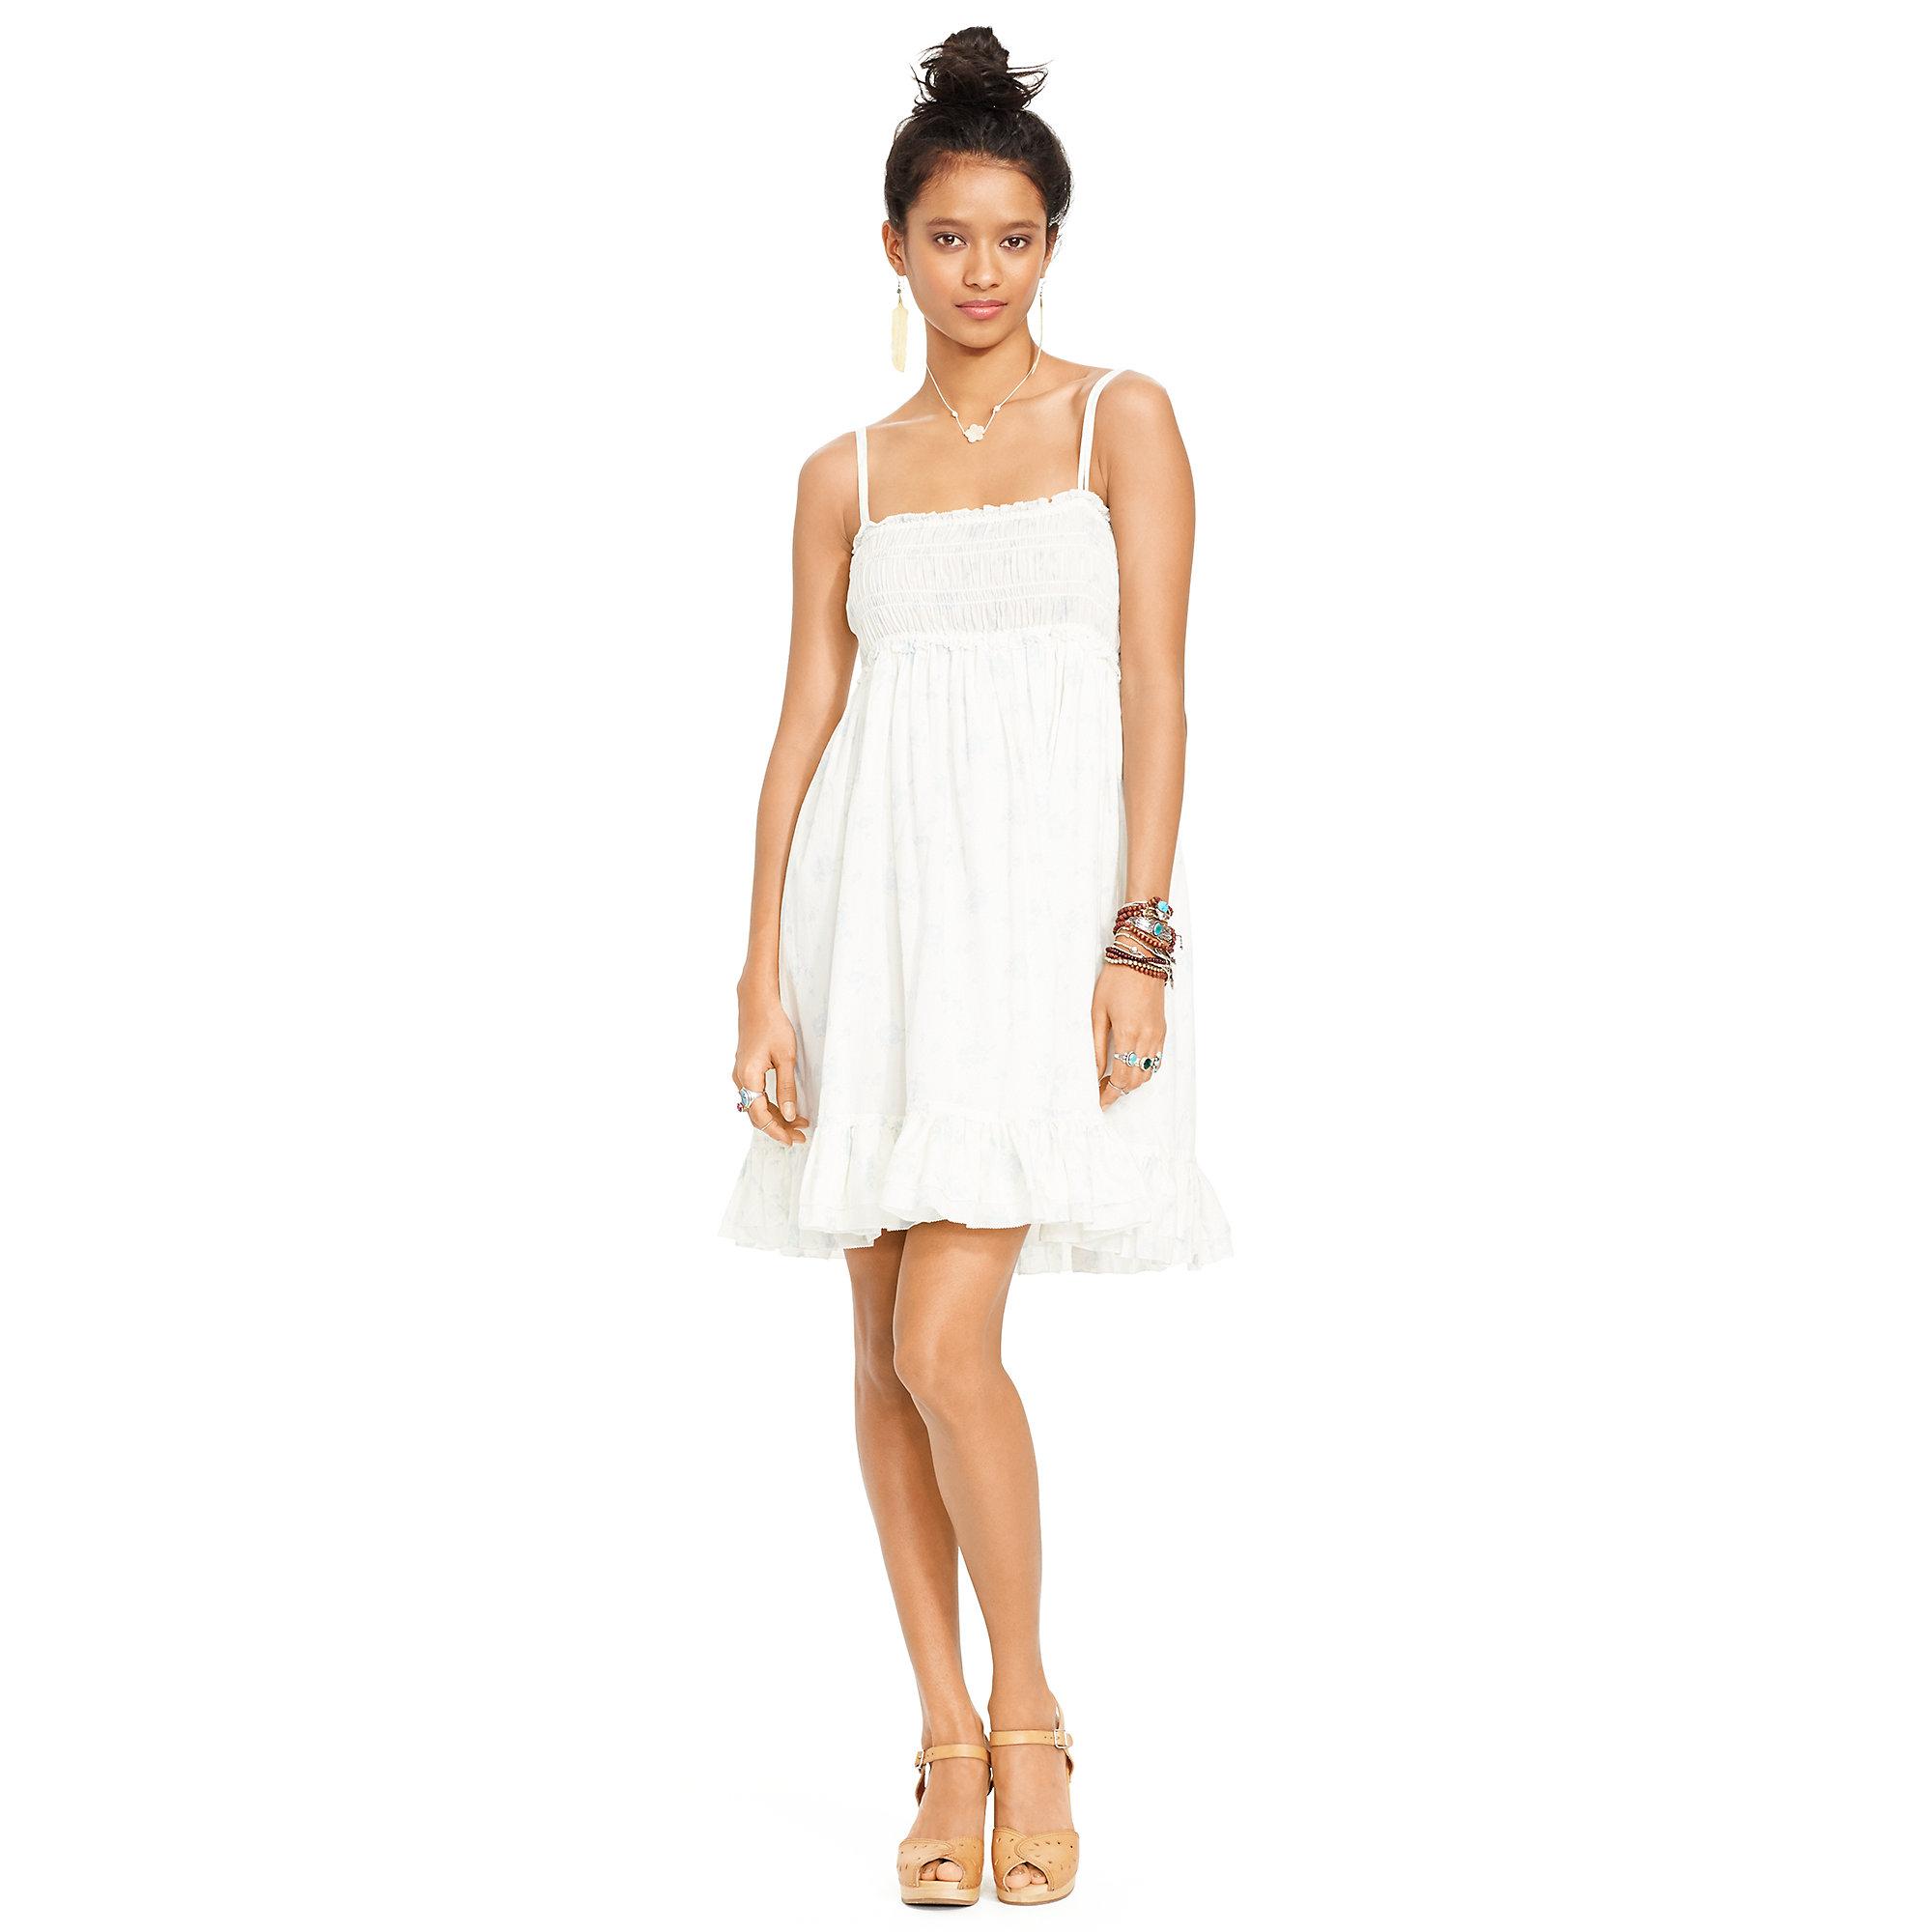 new varieties fashion style new arrival Denim & Supply Ralph Lauren Smocked Cotton Voile Sundress - Lyst